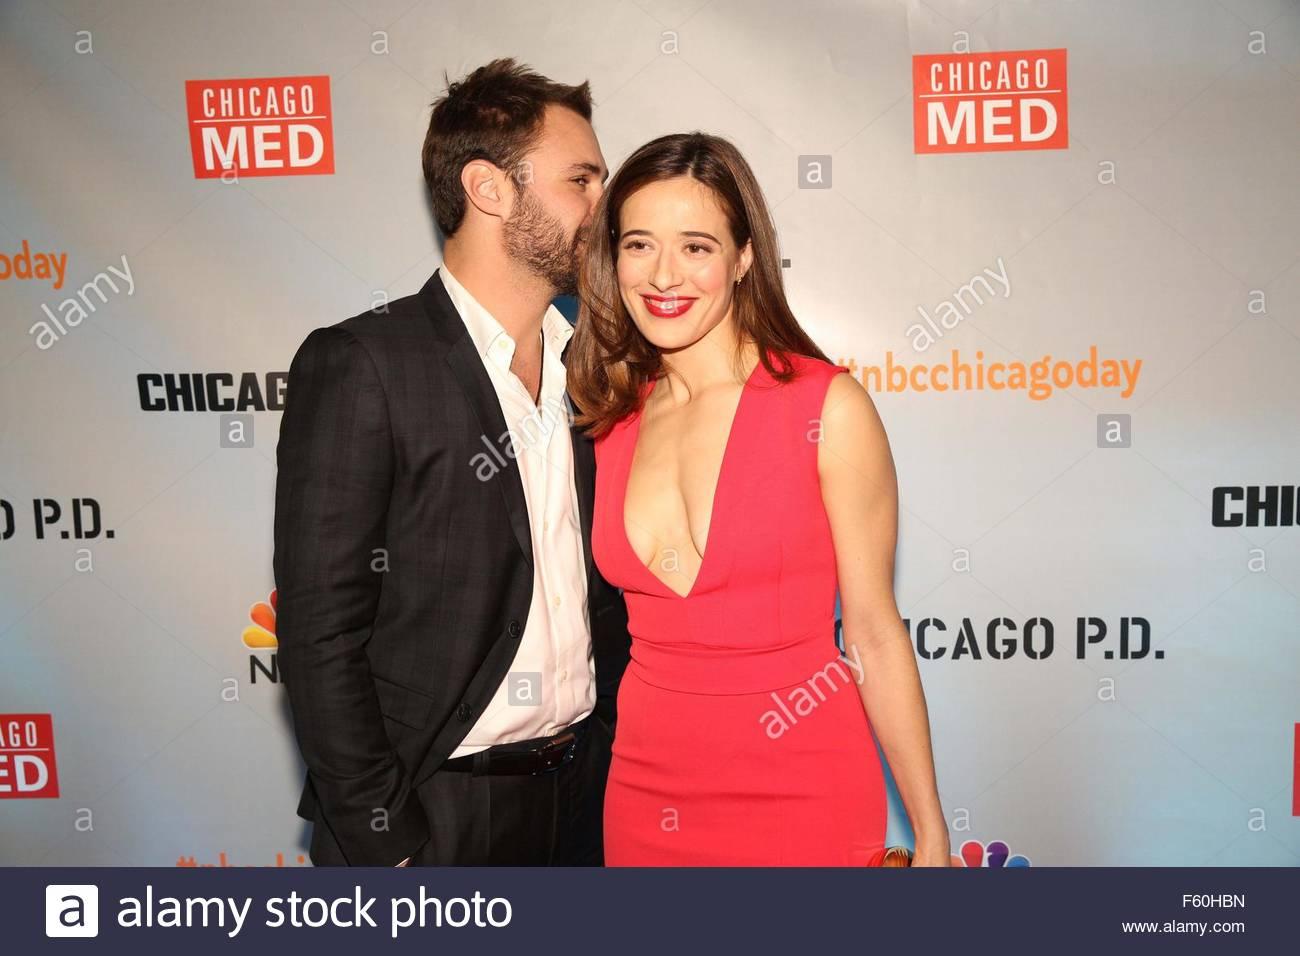 Actress Marina Squerciati and boyfriend Patrick John ...